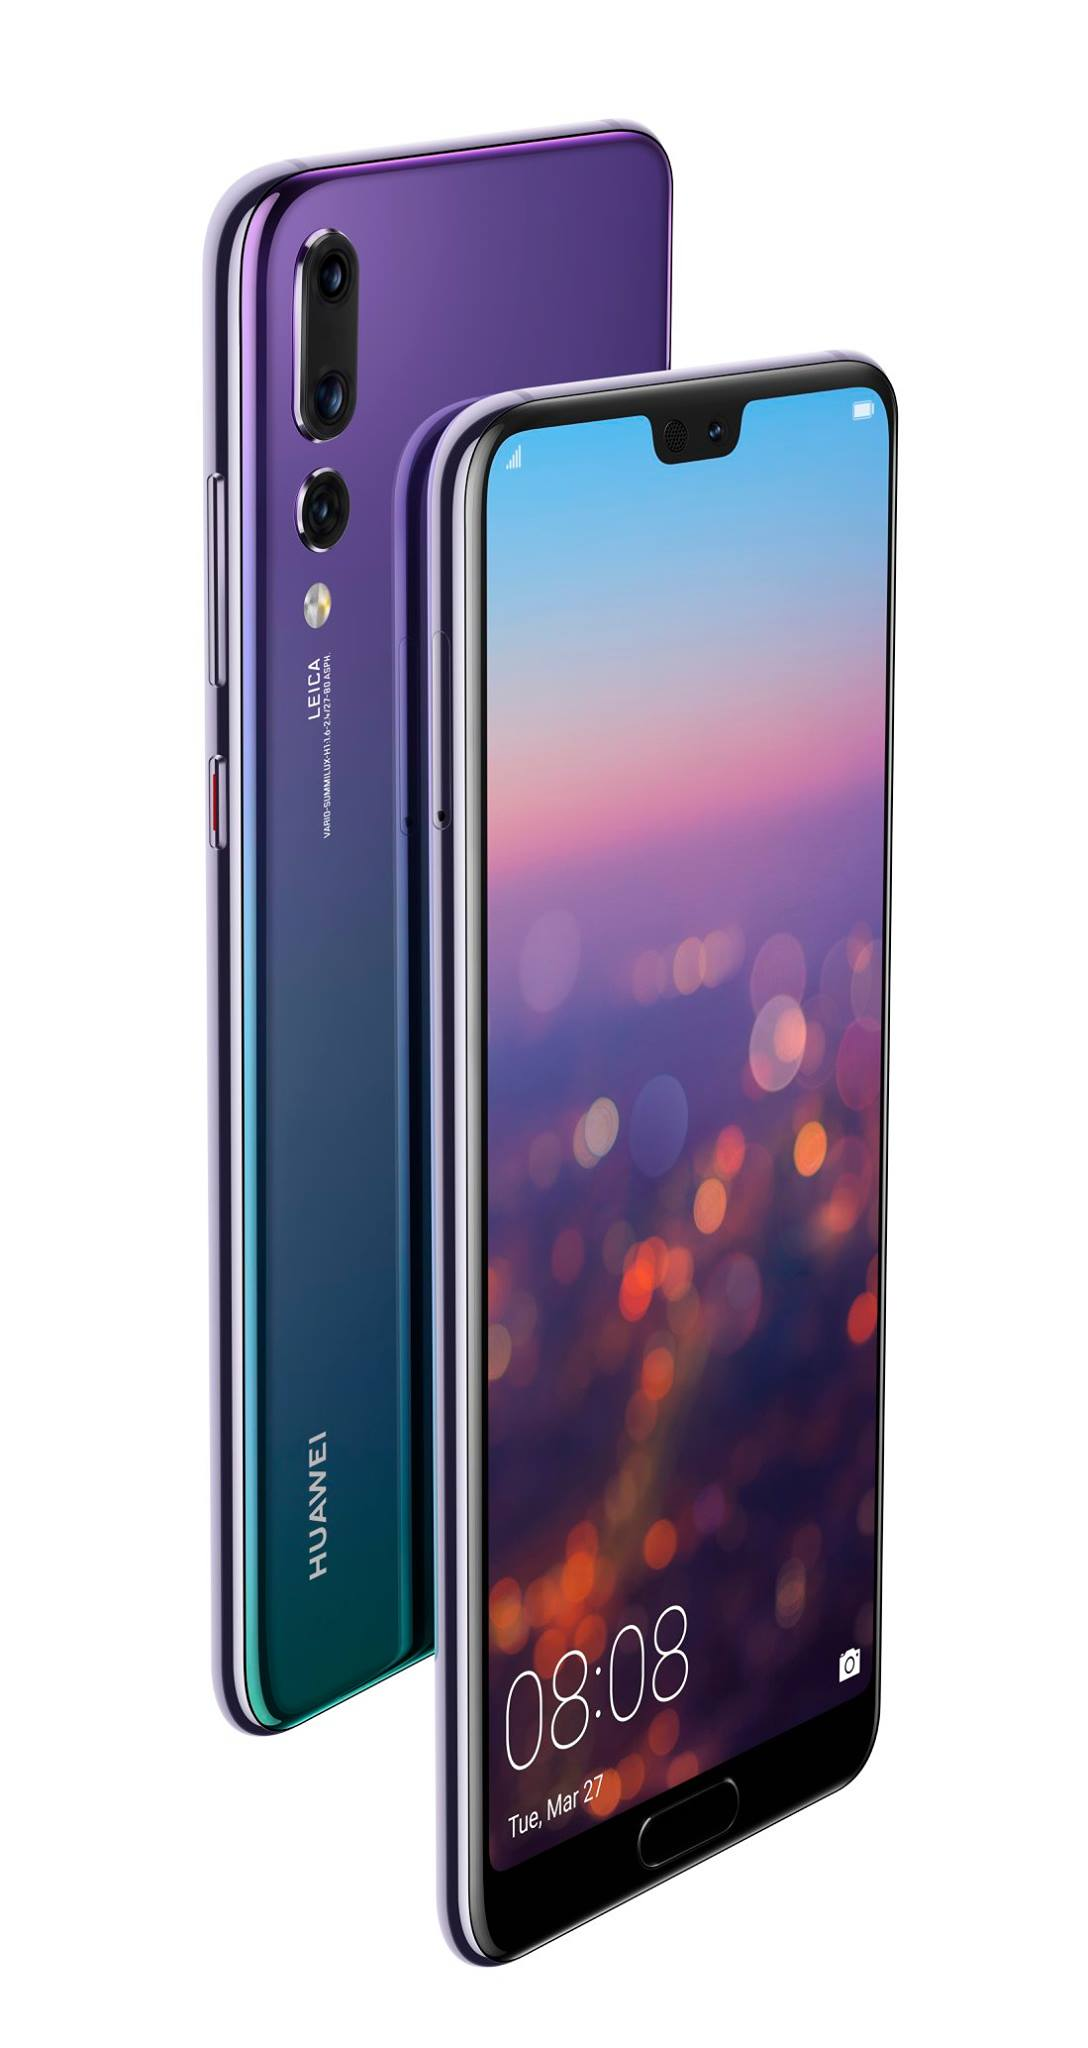 Huawei P20 Pro Twilight Disponible En M 233 Xico Poderpda